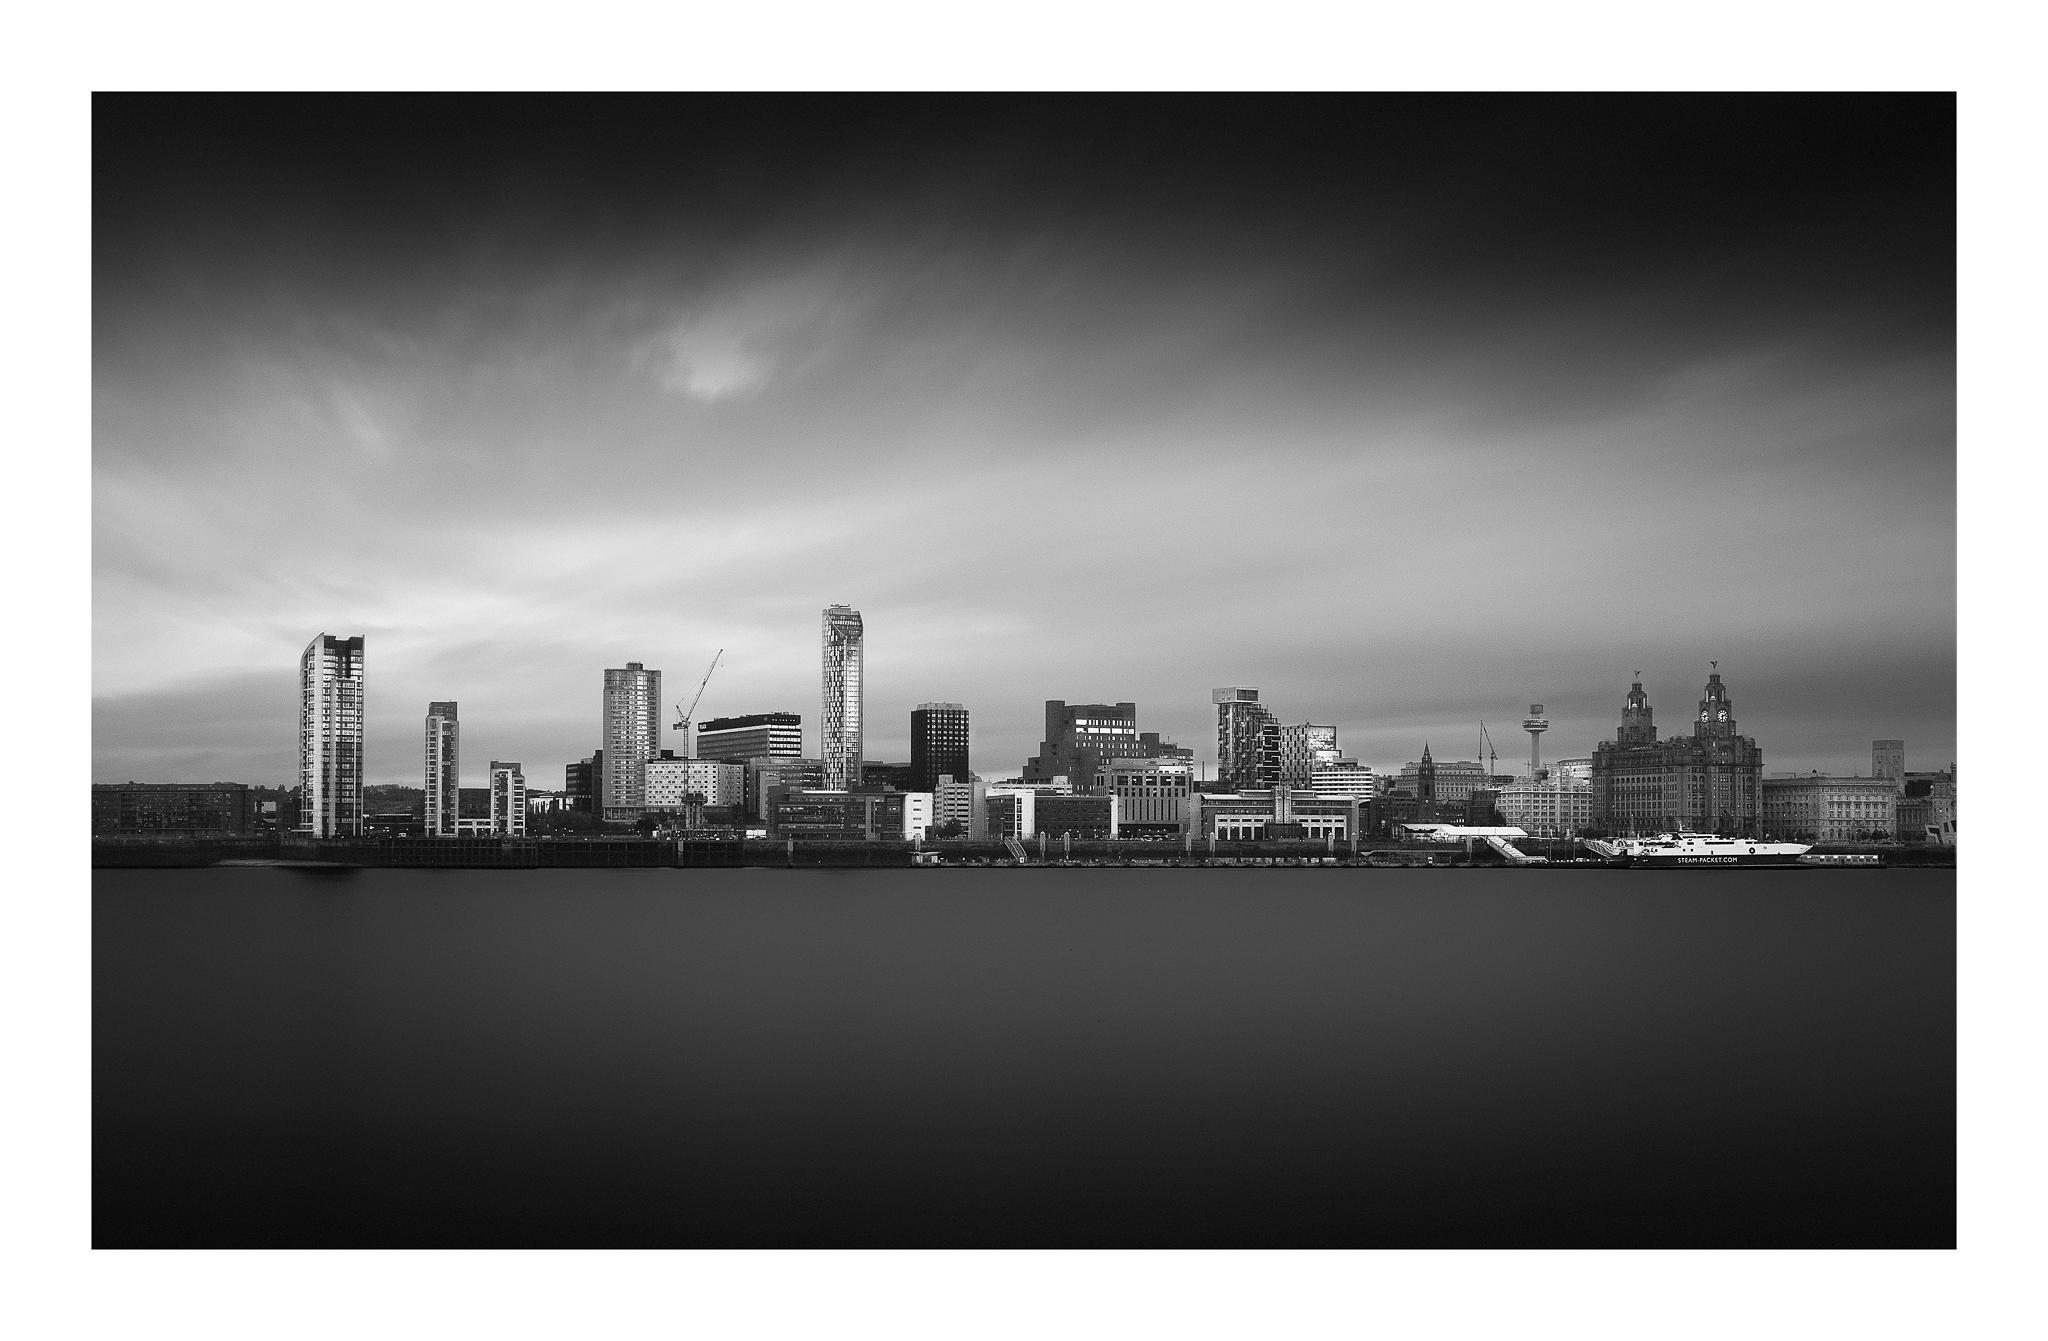 Liverpool Skyline, United Kingdom